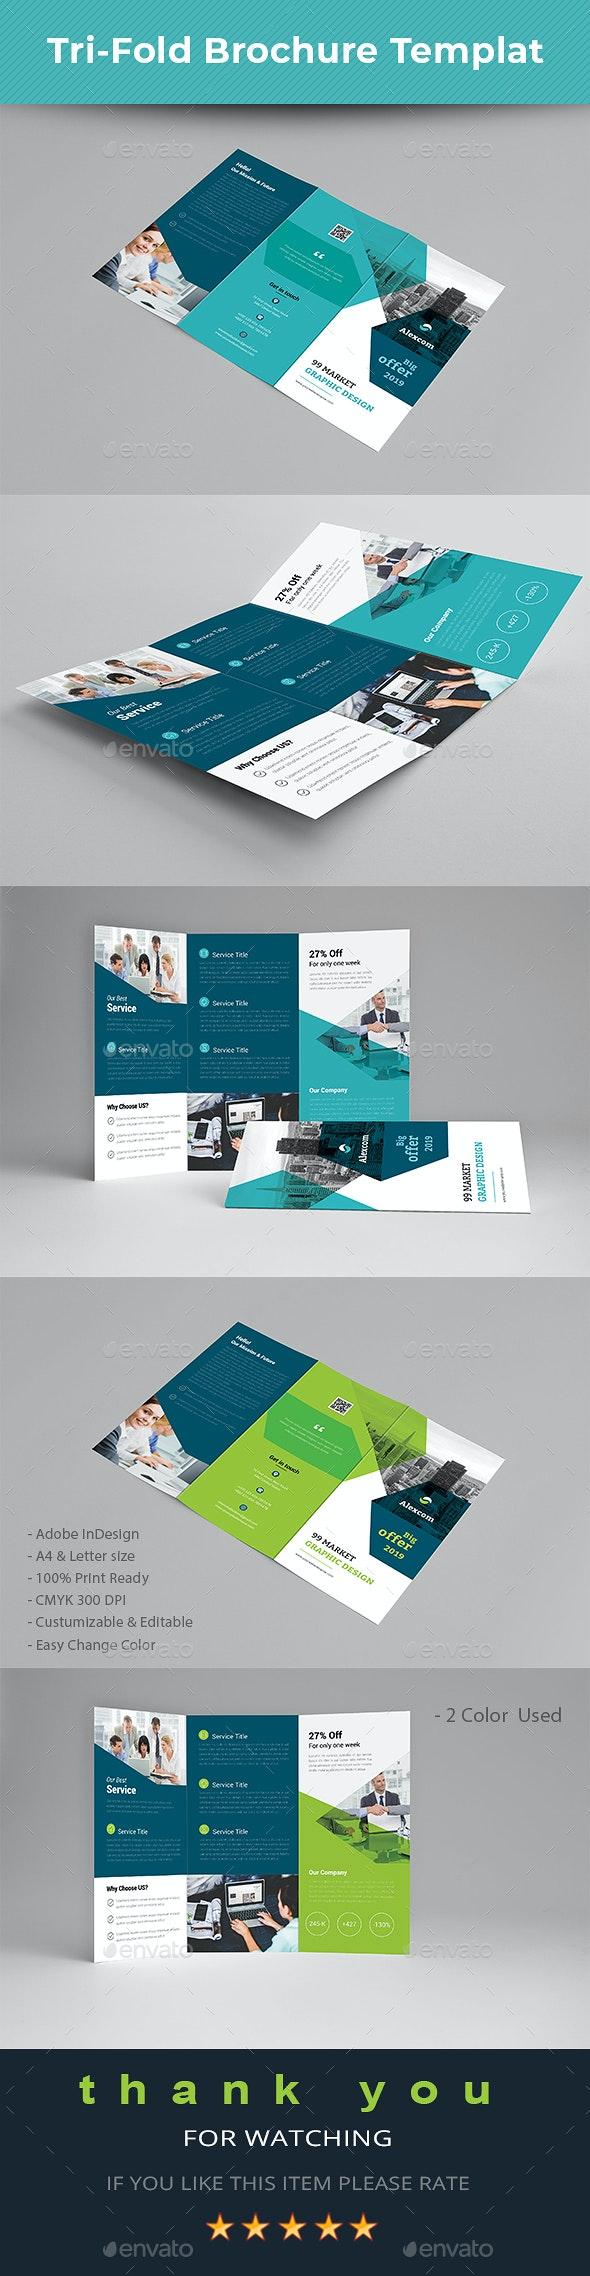 Trifold Brochure Templat - Brochures Print Templates